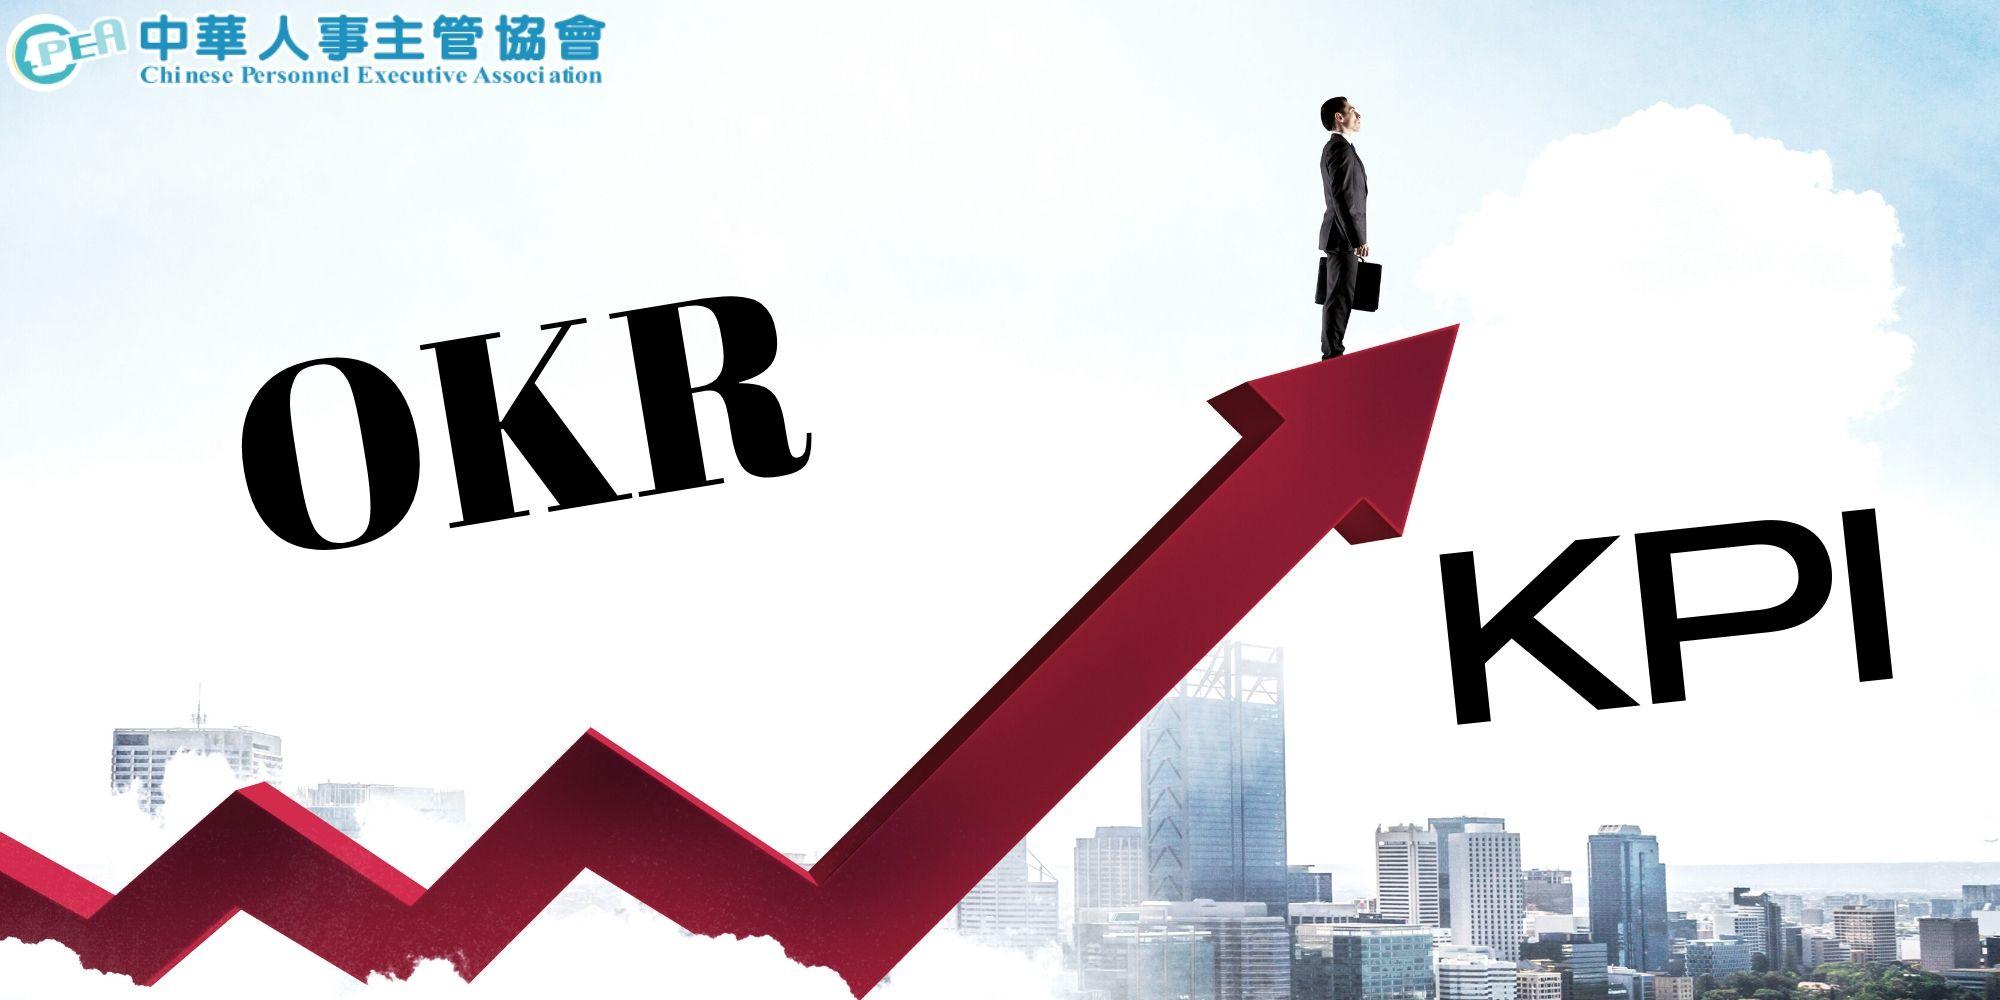 KPI曾經失敗,OKR創新突破、再度奮起